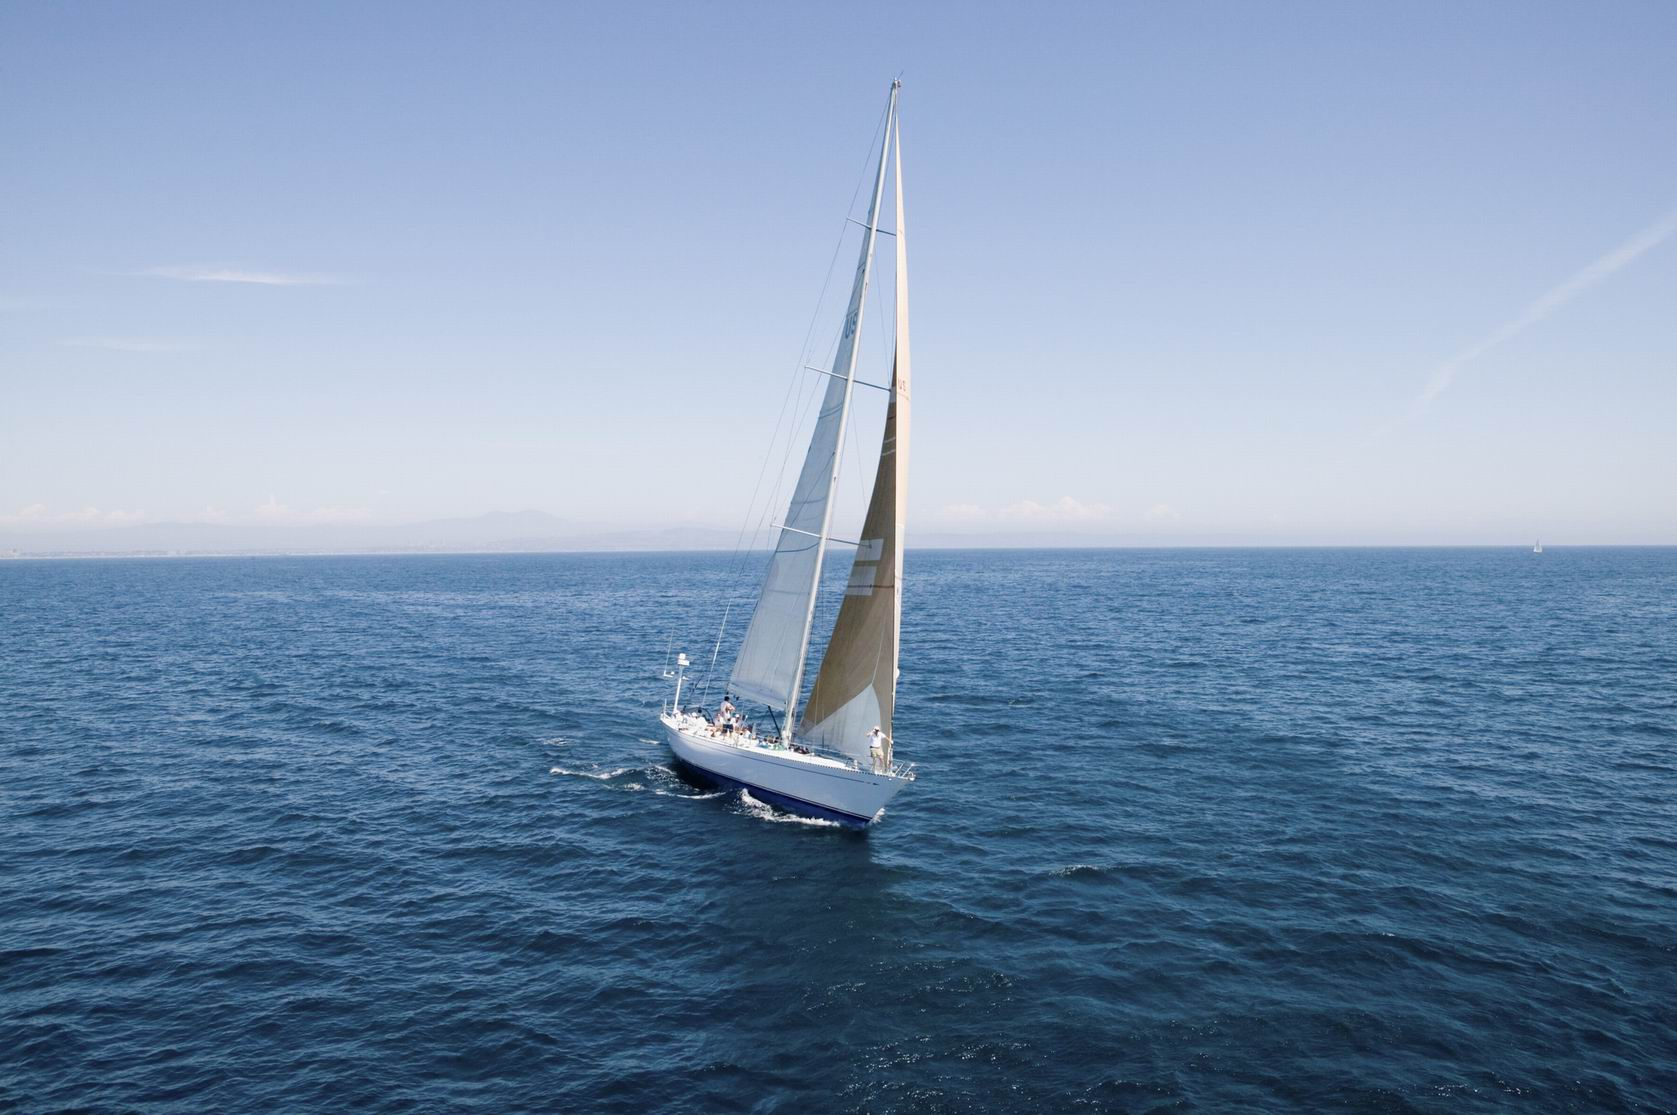 Hillarys Yacht Club offers free children's sailing day